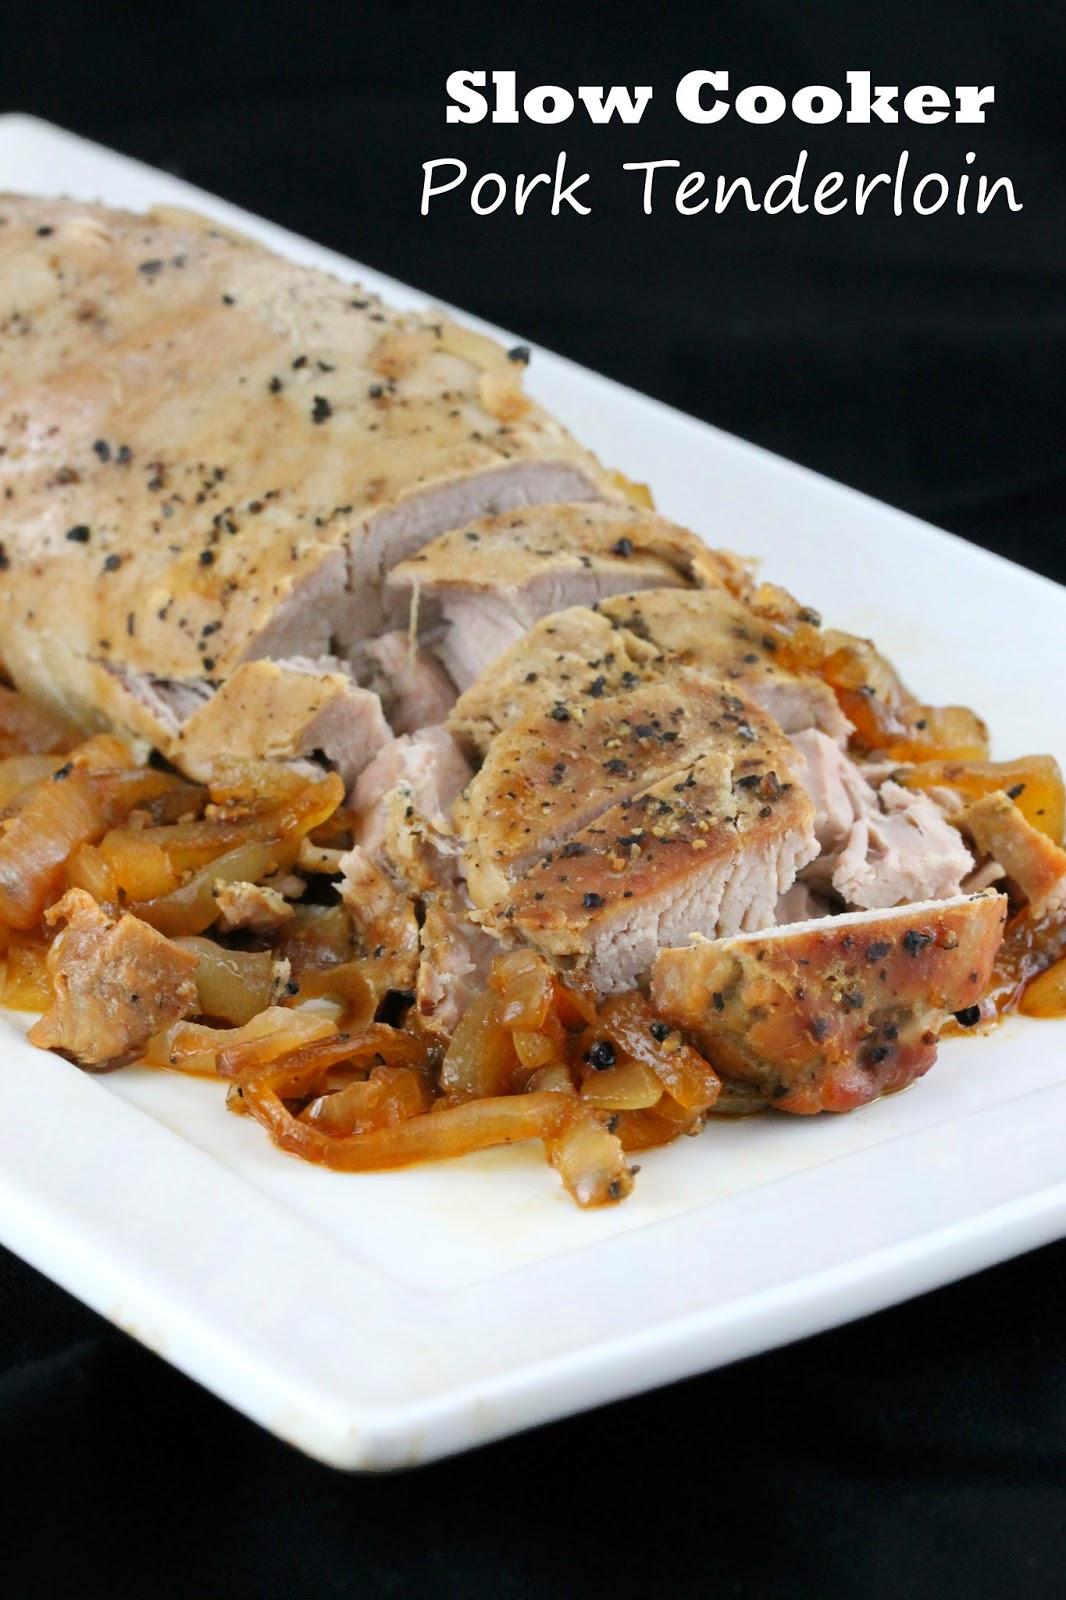 Quick Prep Slow Cooker Pork Tenderloin